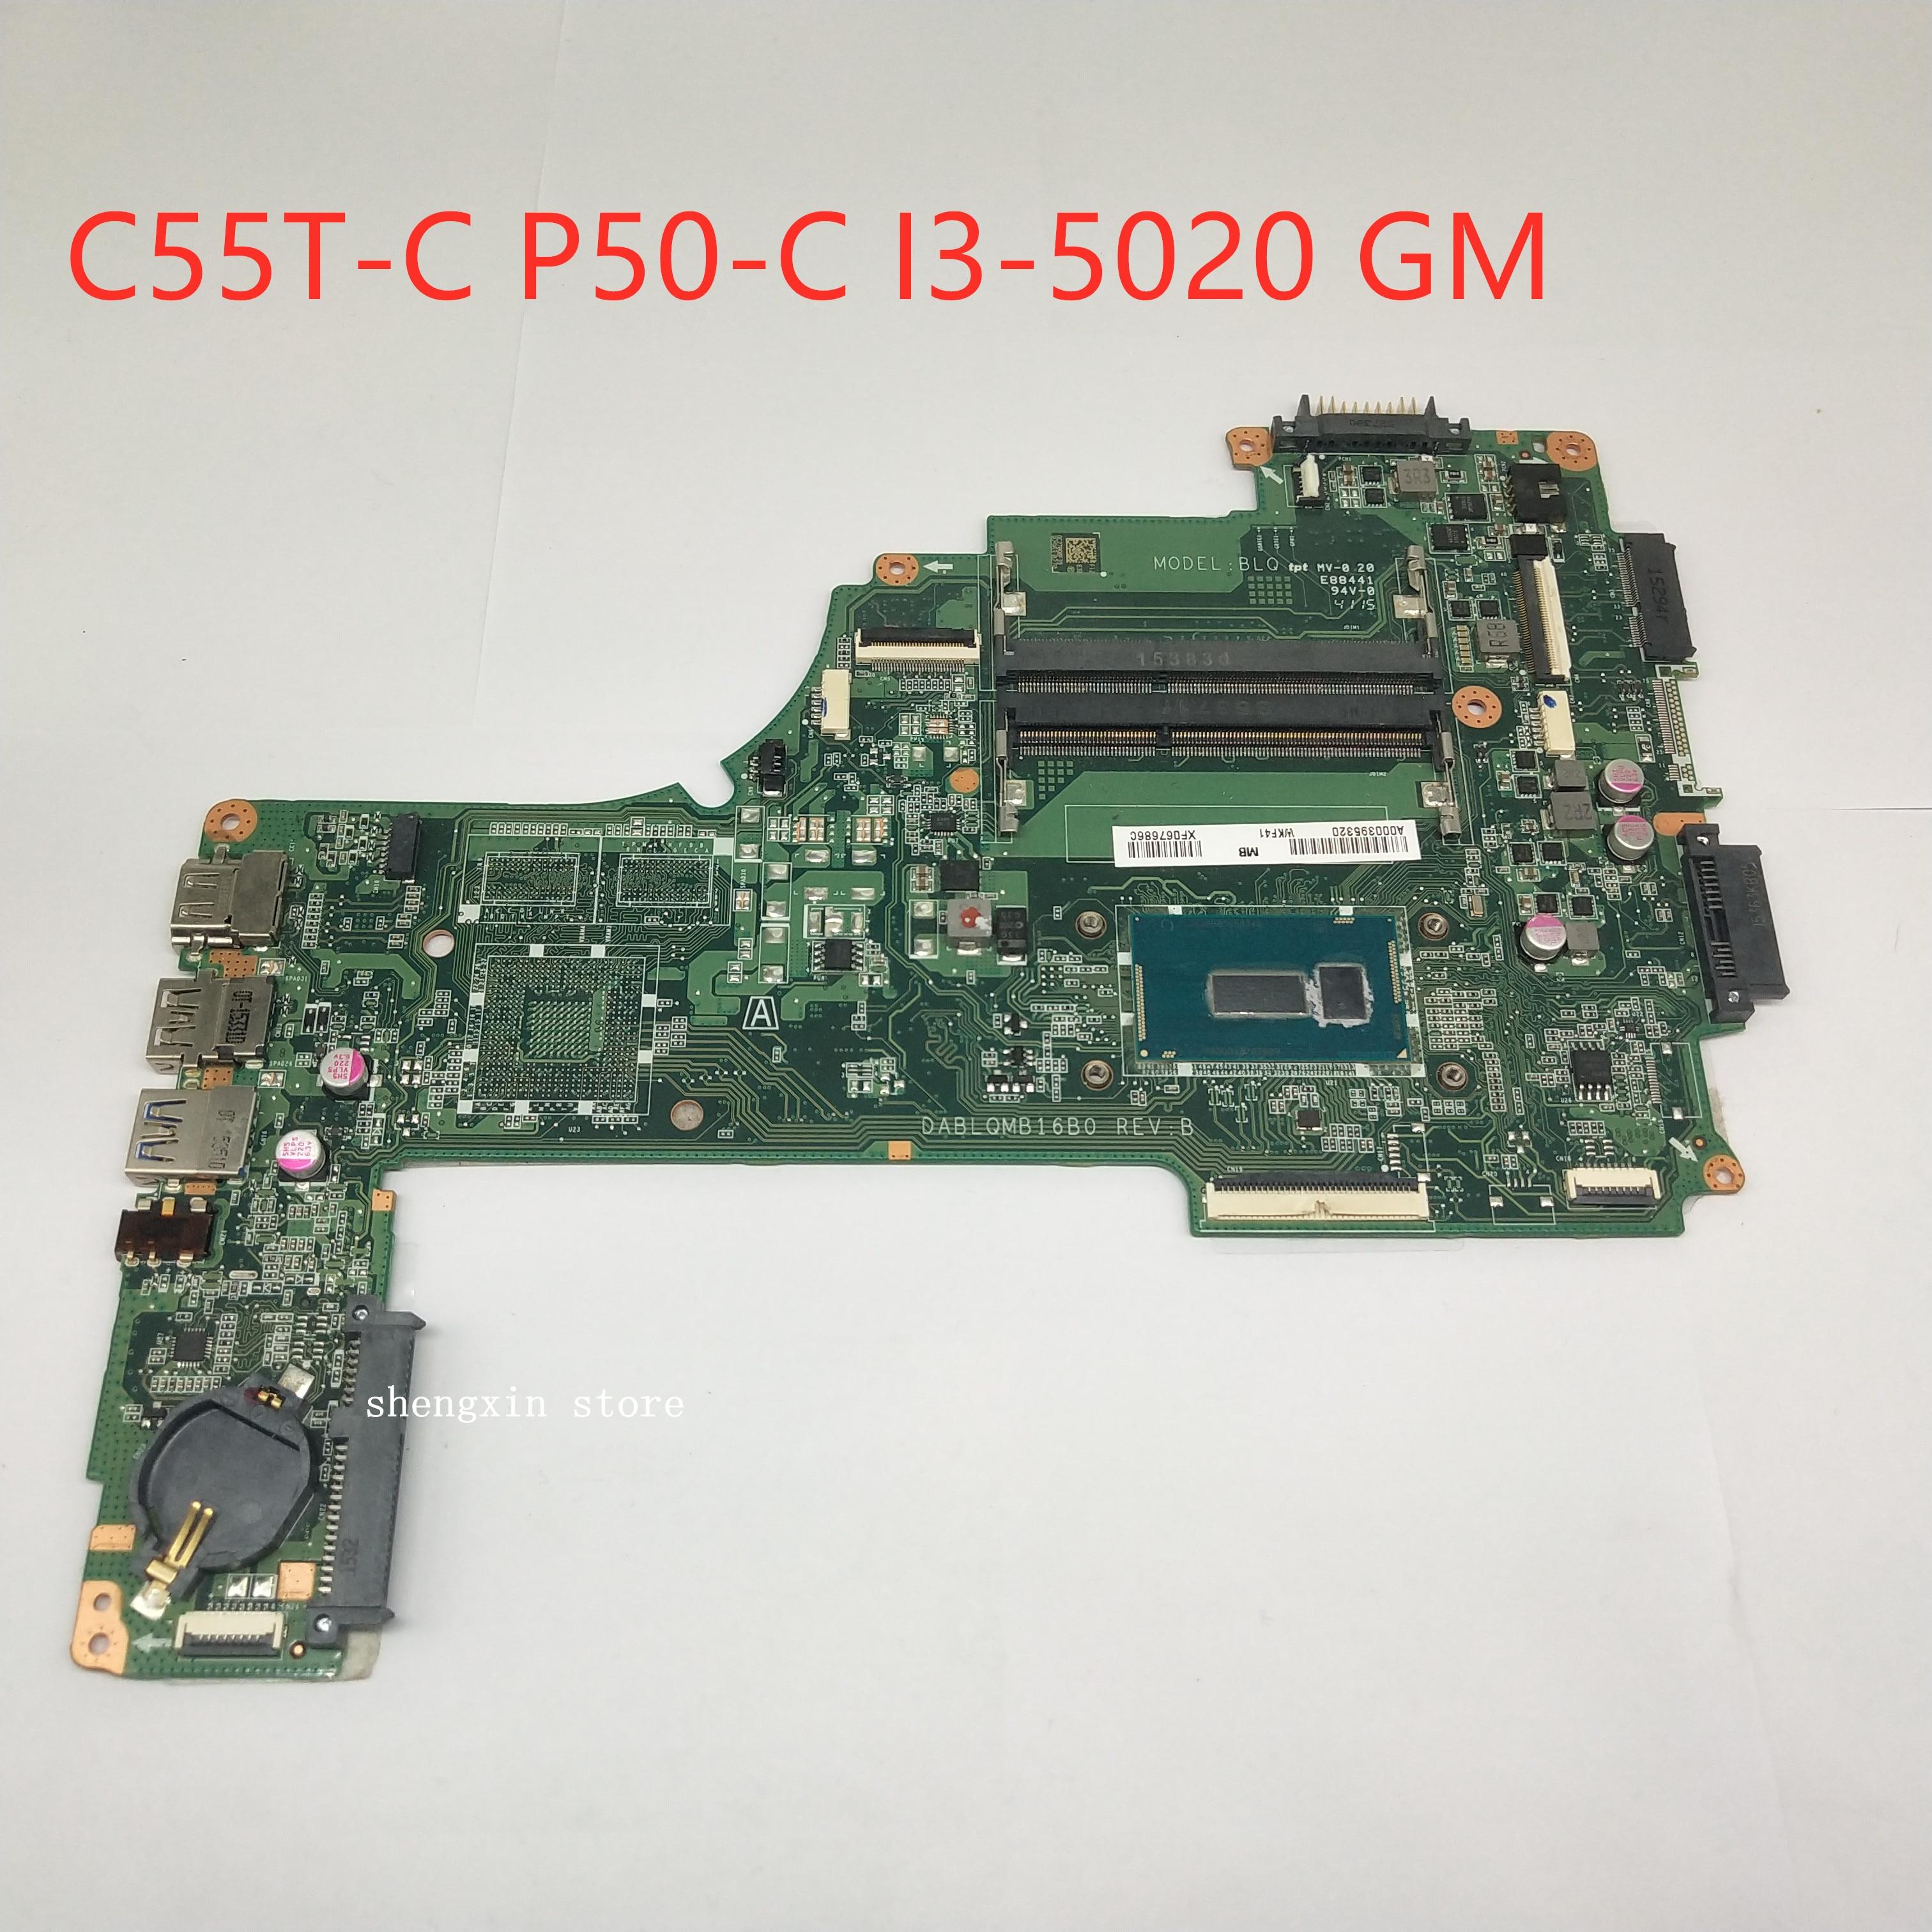 Toshiba Satellite C50-C C55-C placa base de computadora portátil A000393940 DABLQMB16B0 SR1EK i3-4005U placa base de prueba 100%